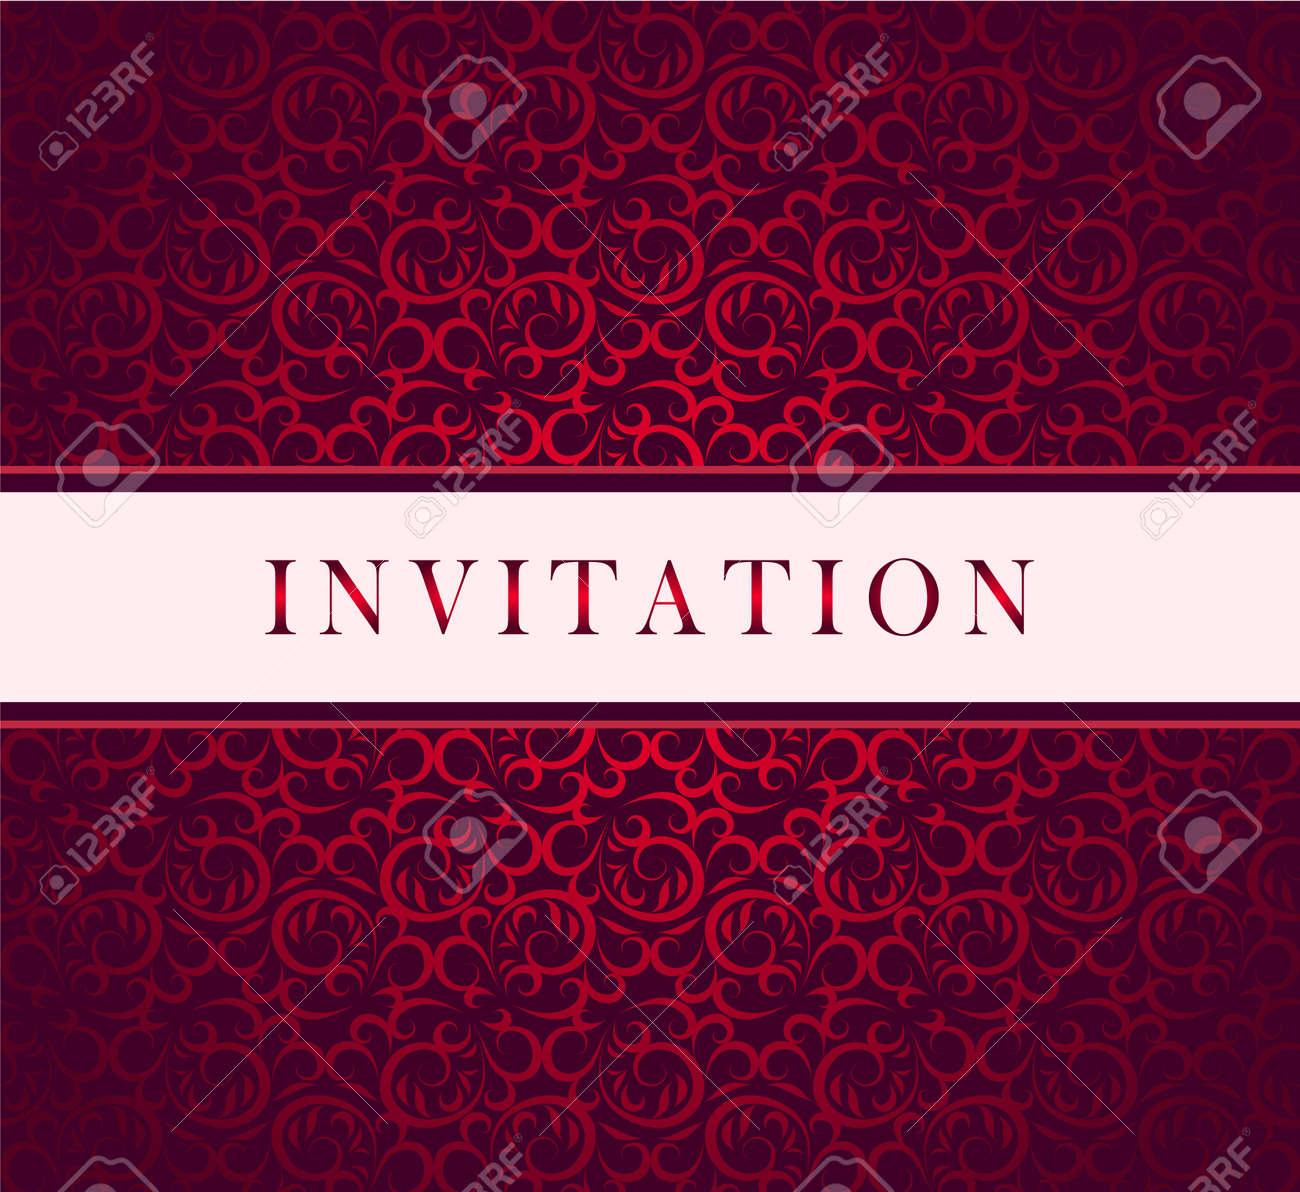 Invitation Red Ornament Card Royalty Free Cliparts Vectors And – Invite Card